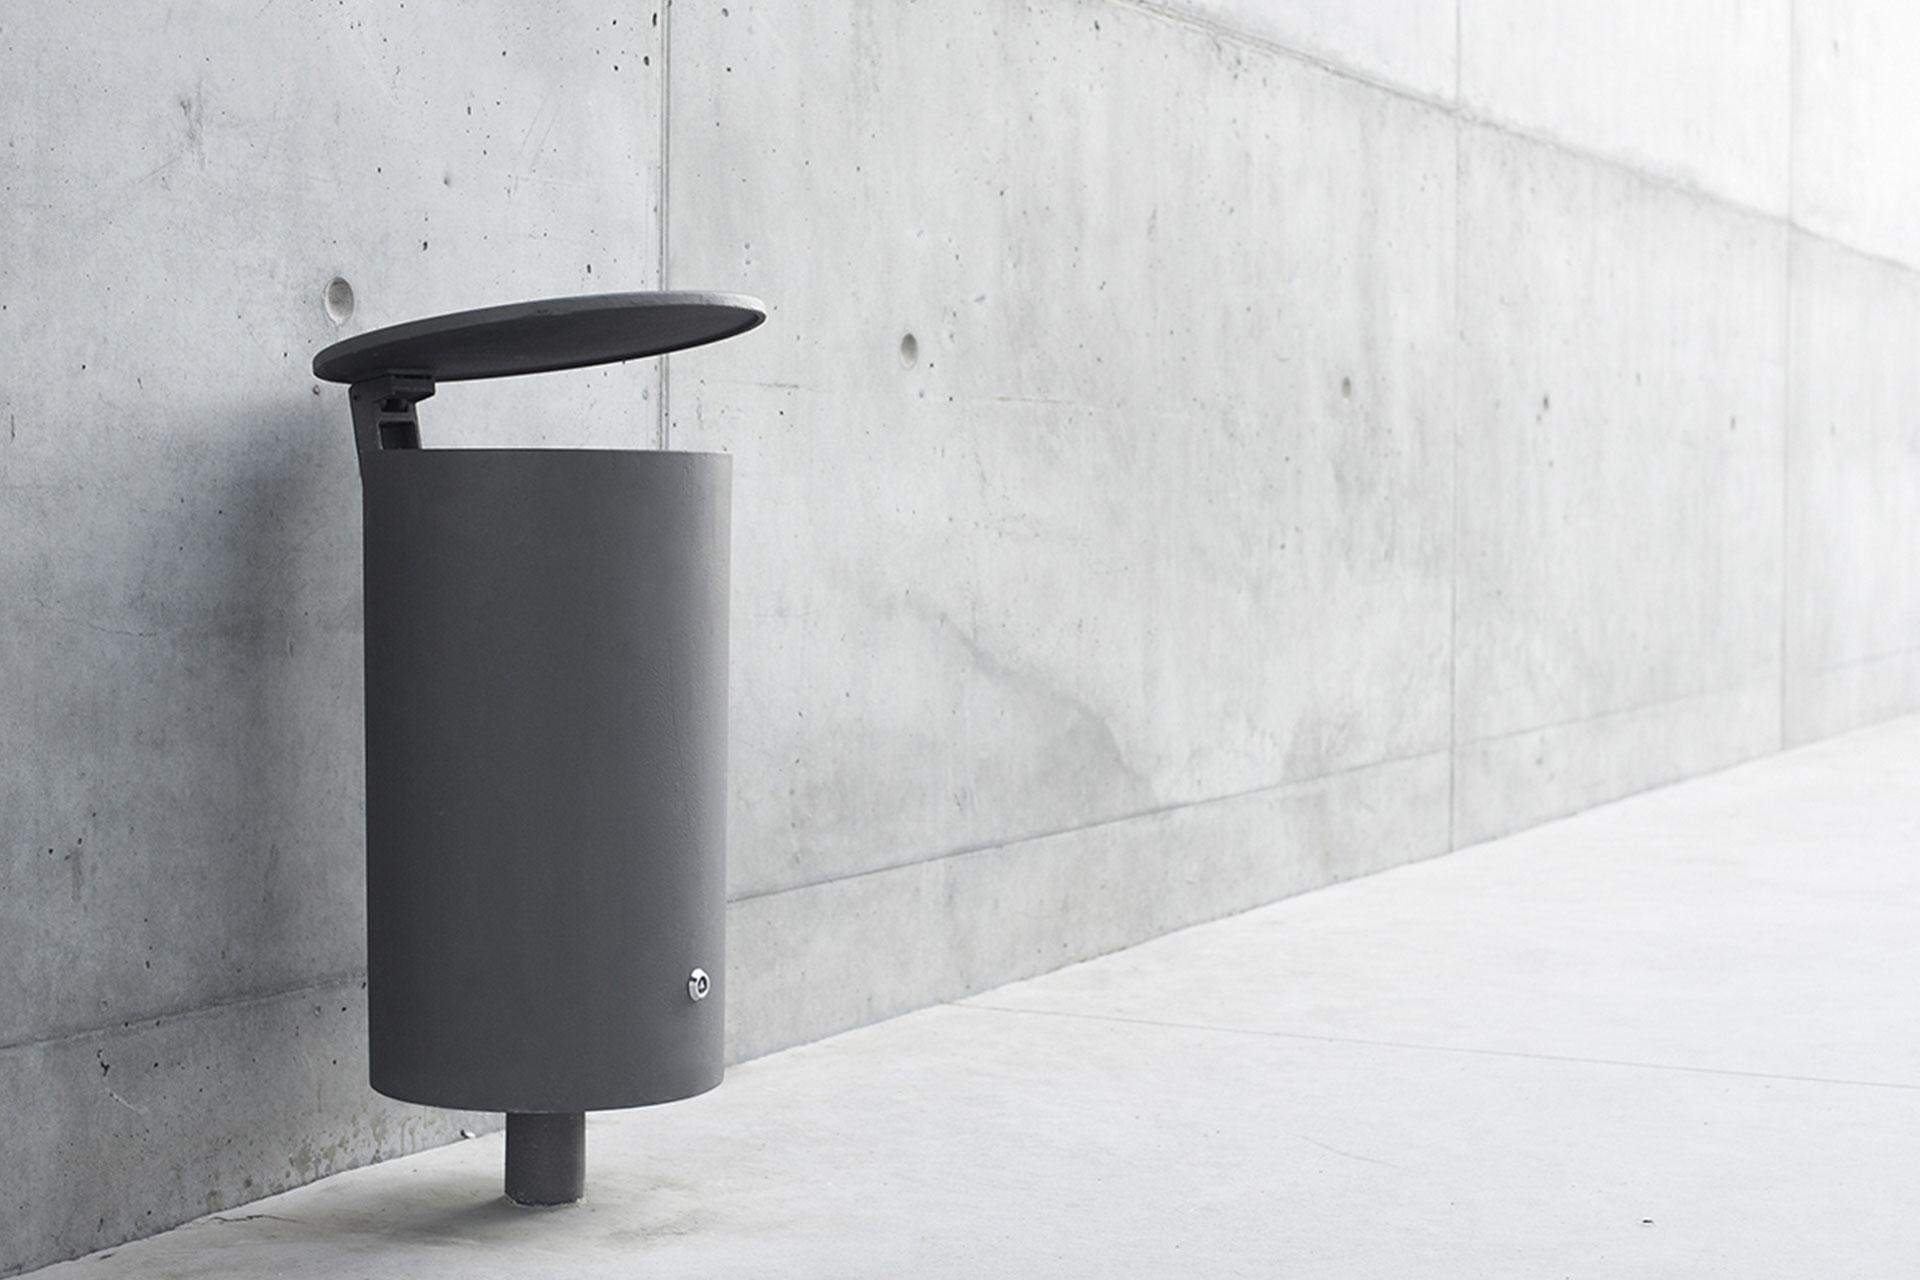 UrbanObjekts Point Abfallbehälter